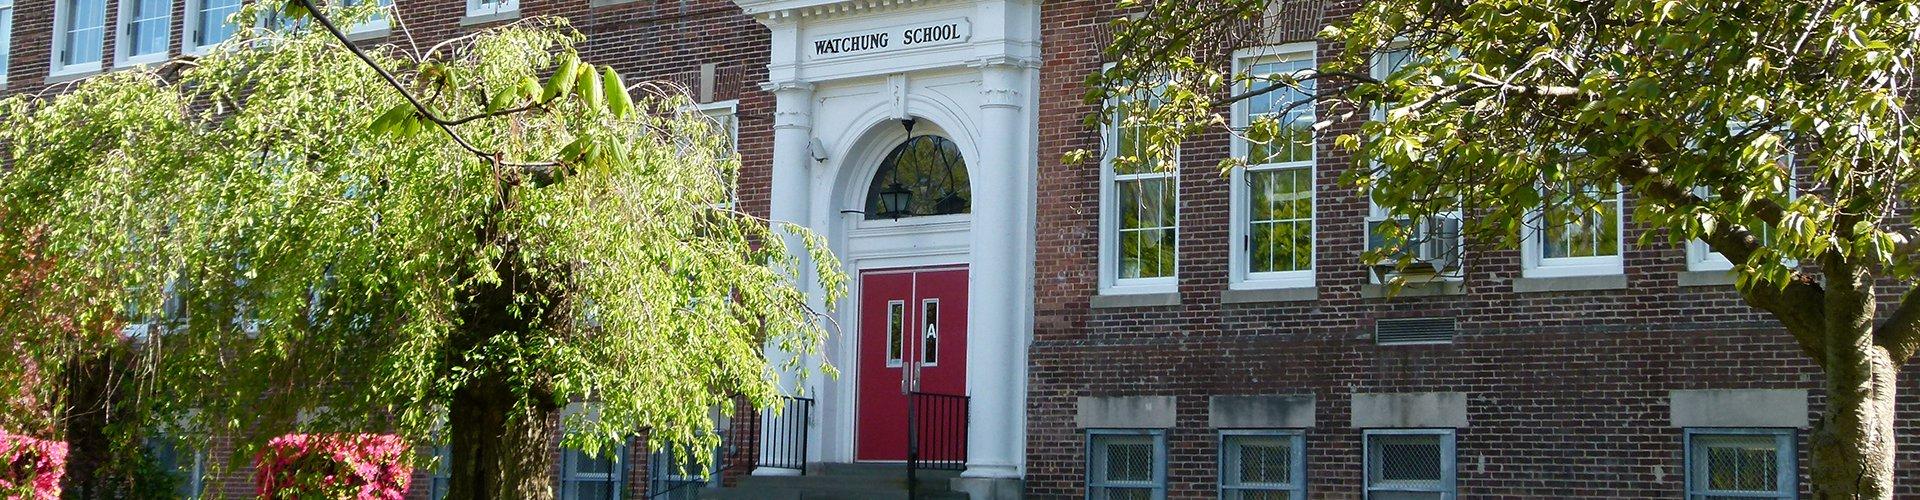 Watchung School